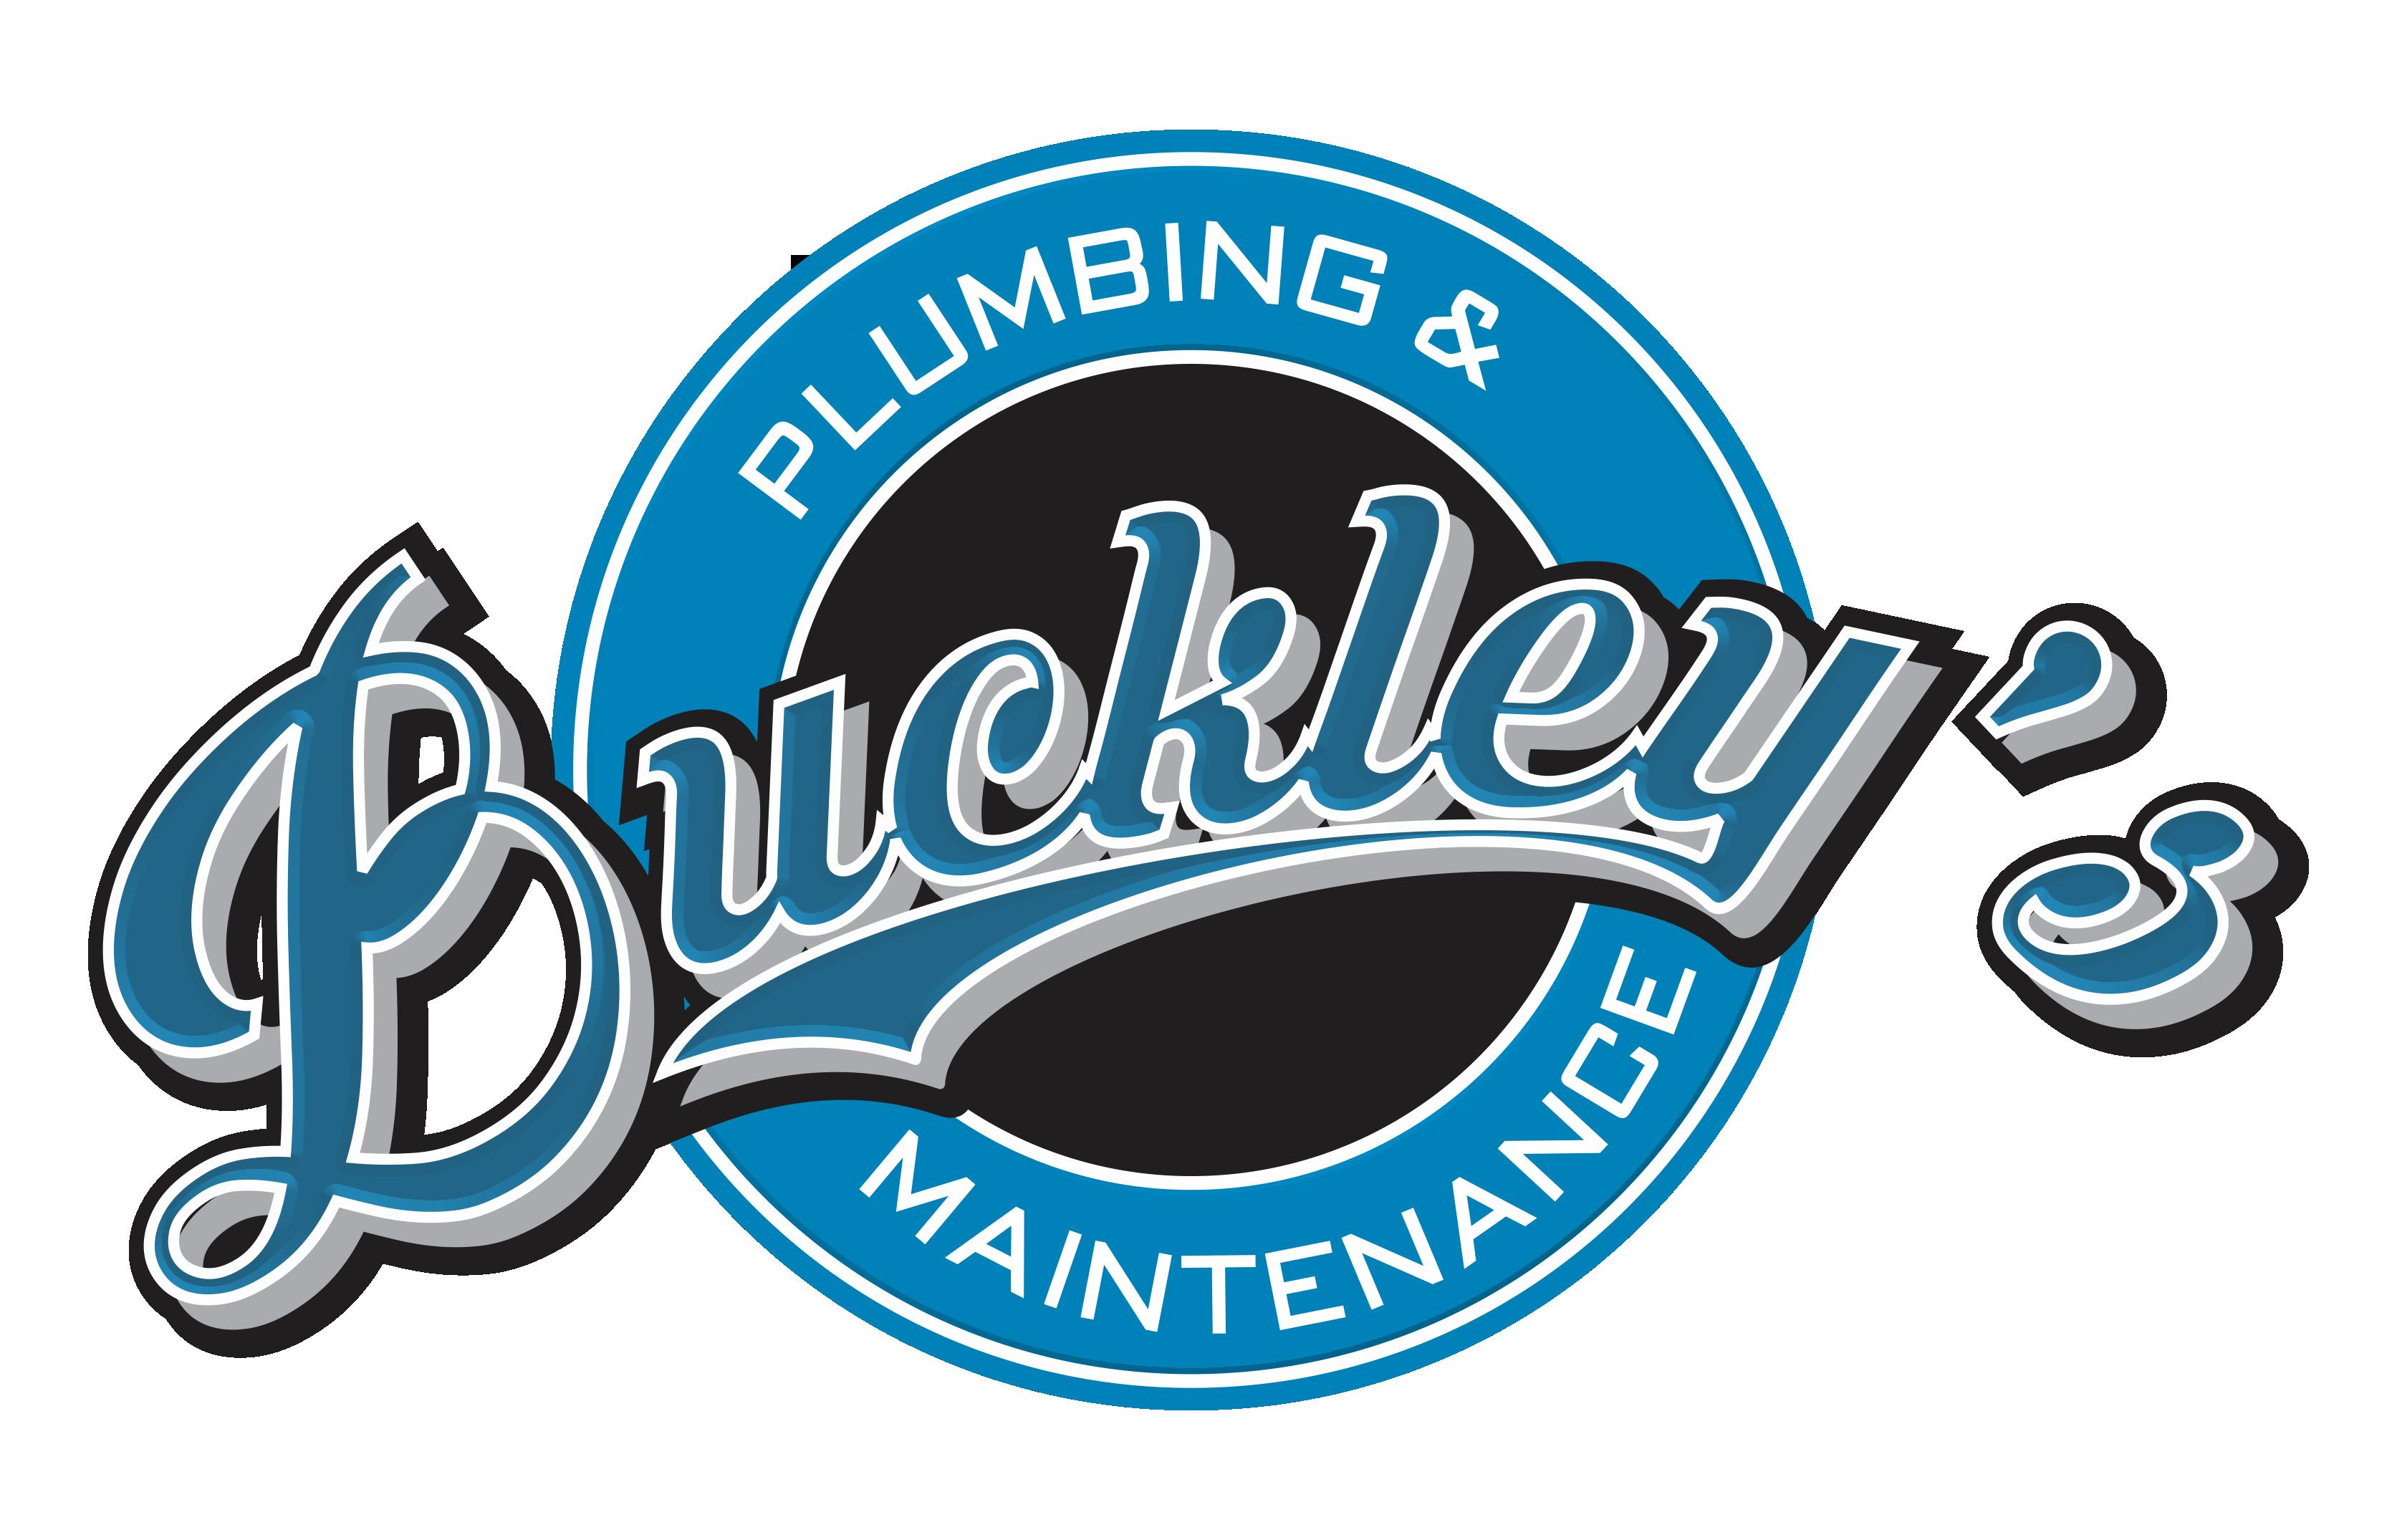 Buckley's Plumbing & Maintenance image